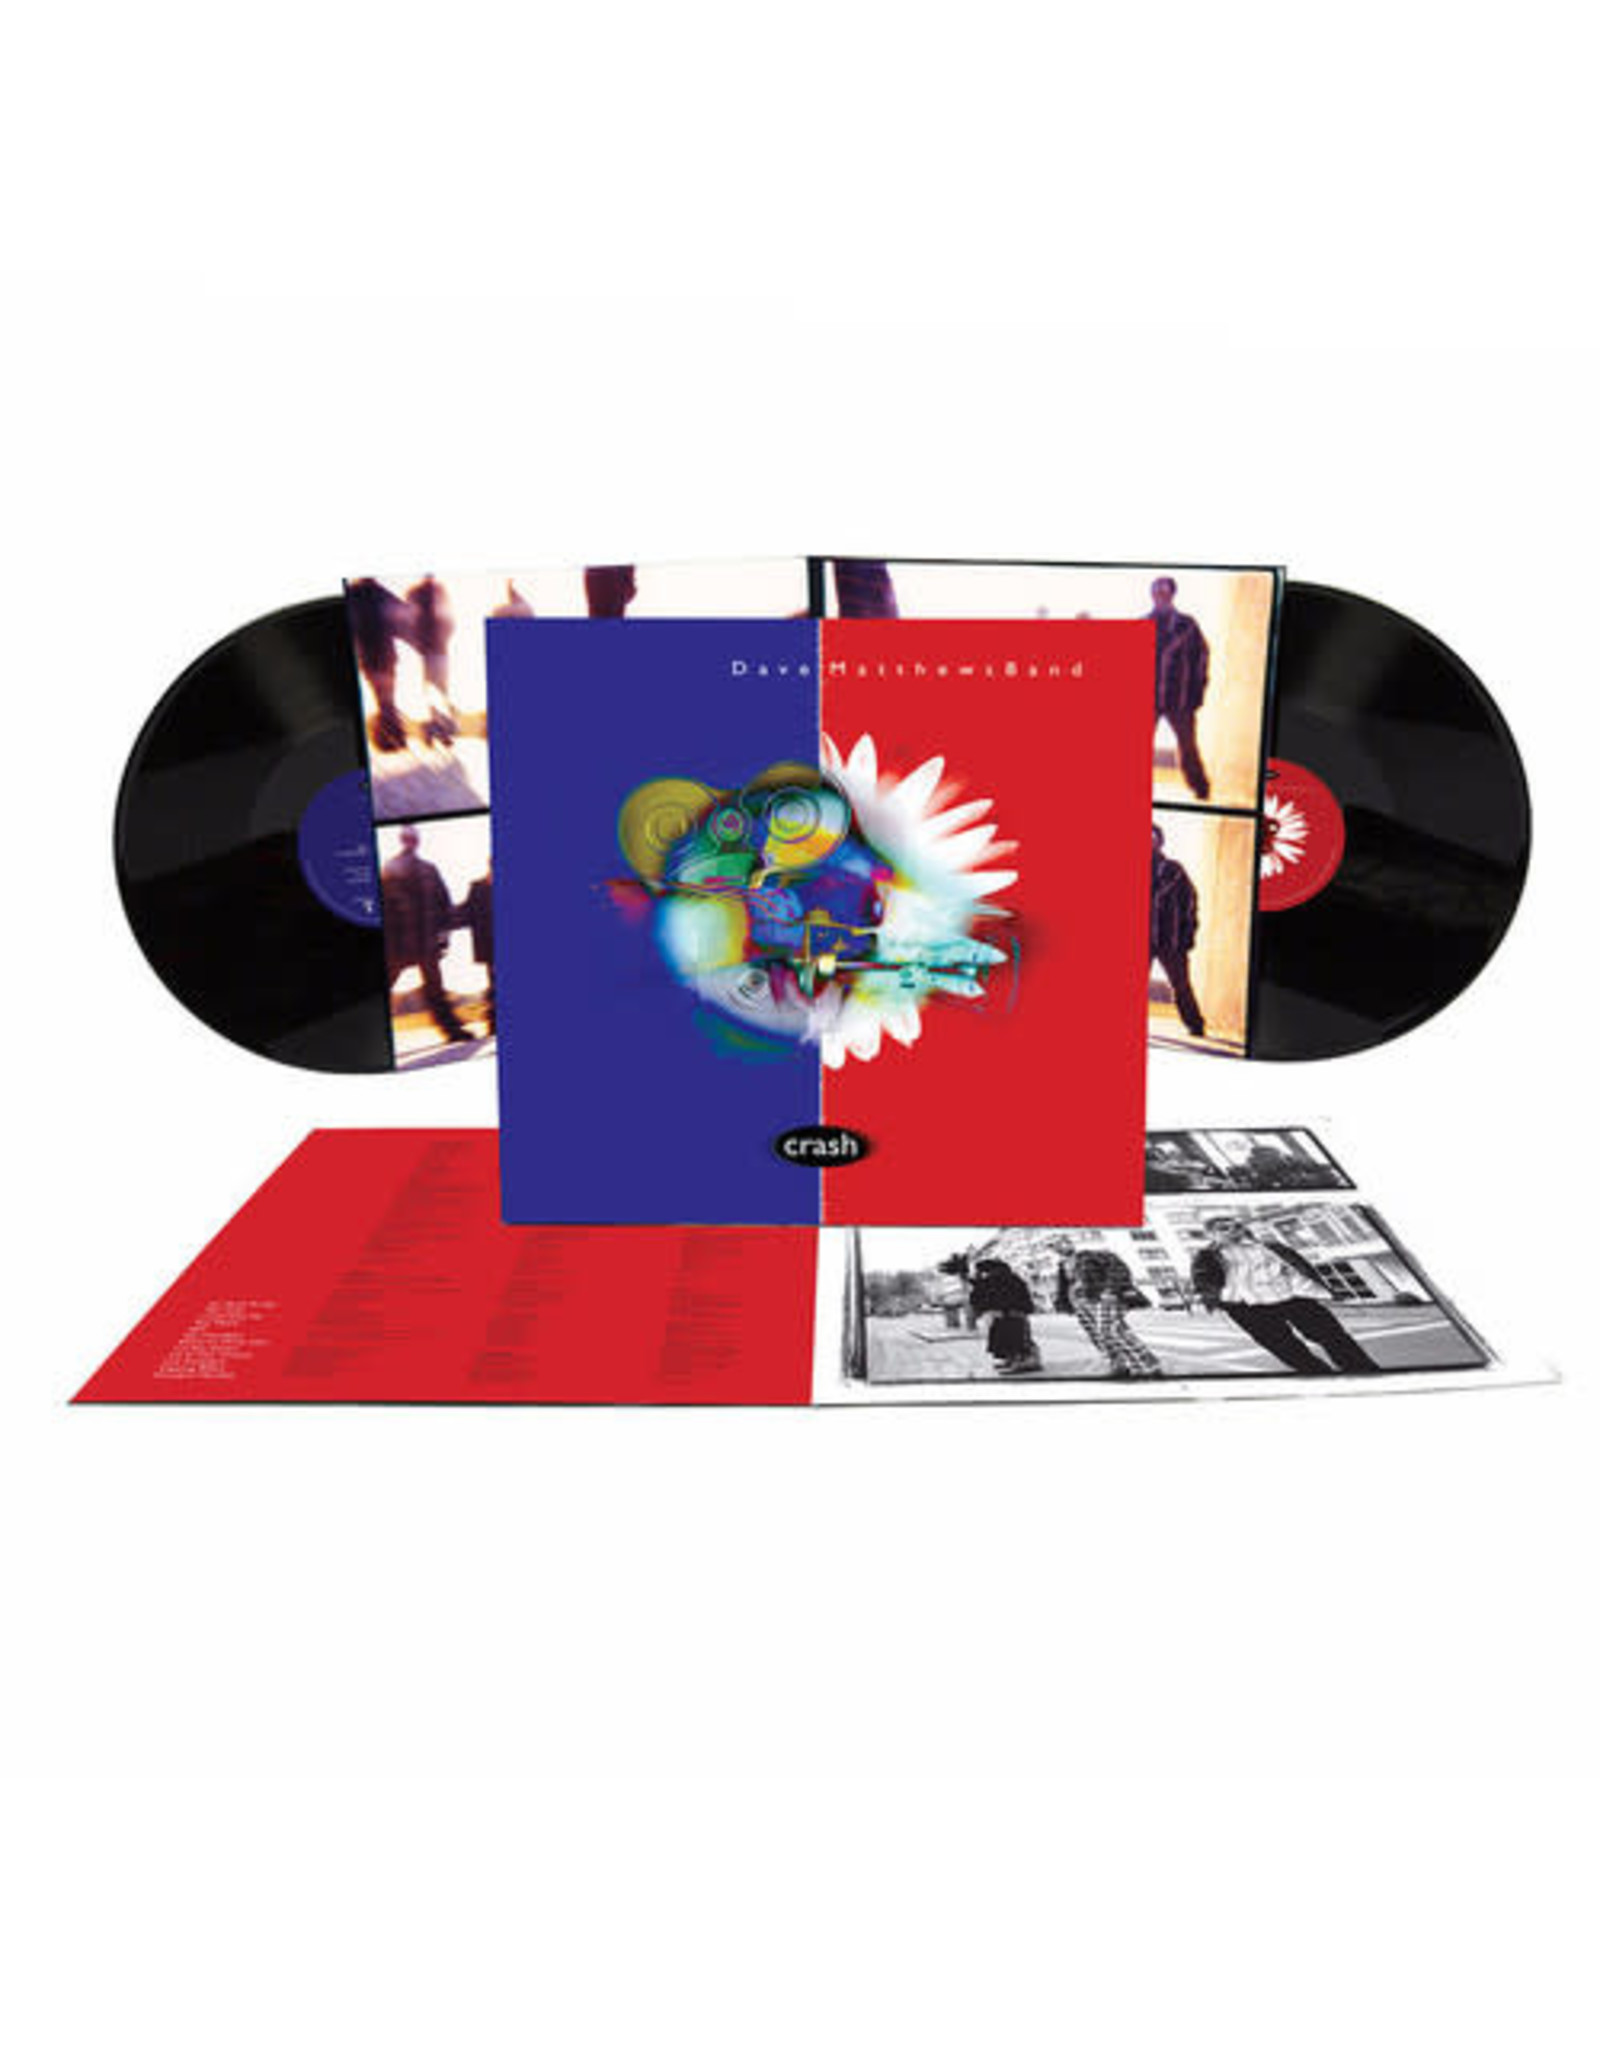 New Vinyl Dave Matthews Band - Crash 2LP